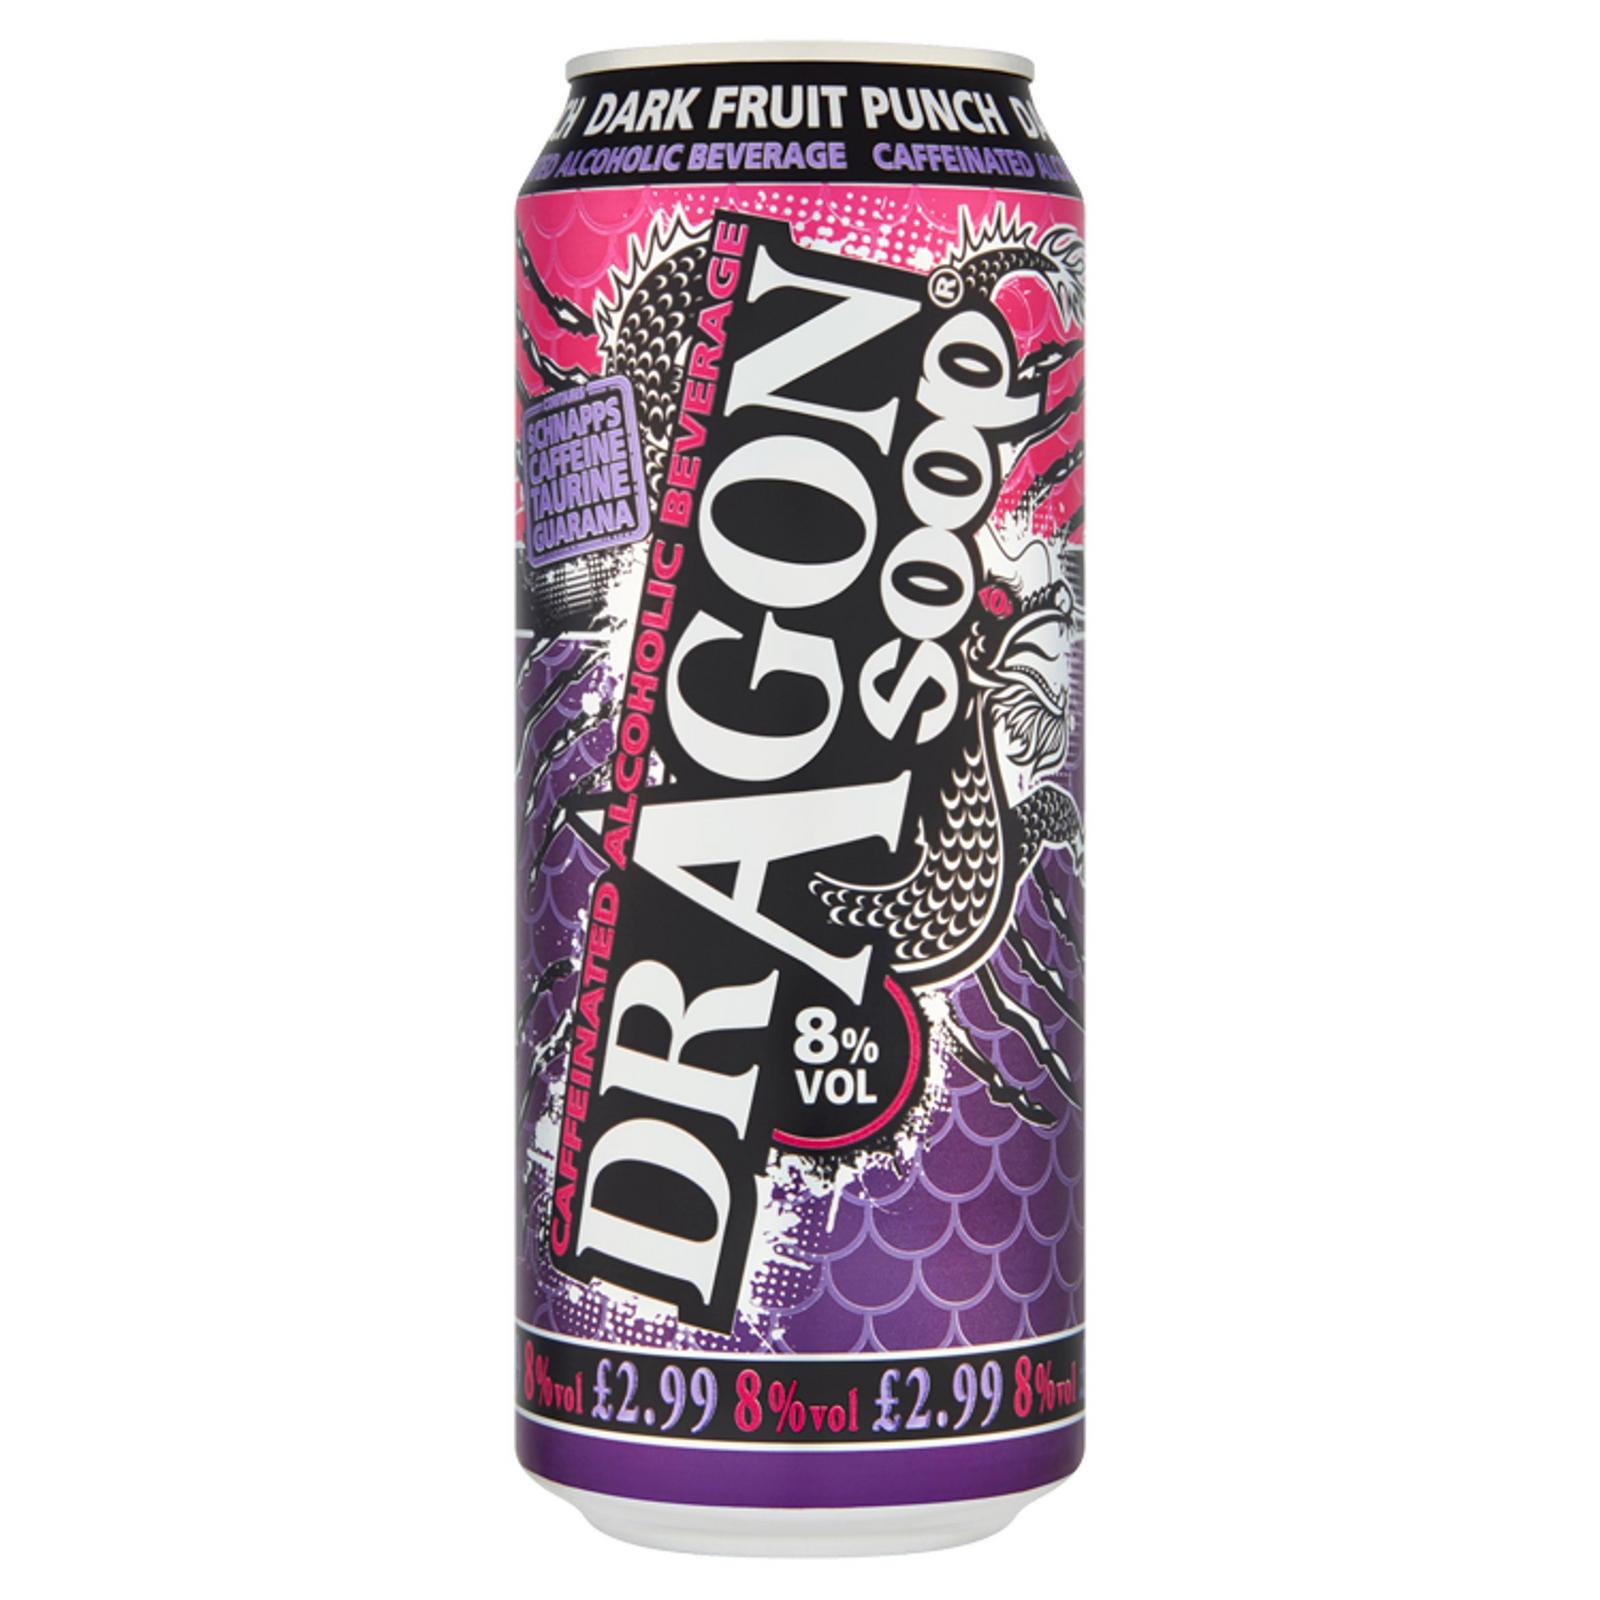 Dragon Soop Dark Fruit Punch Caffeinated Alcoholic